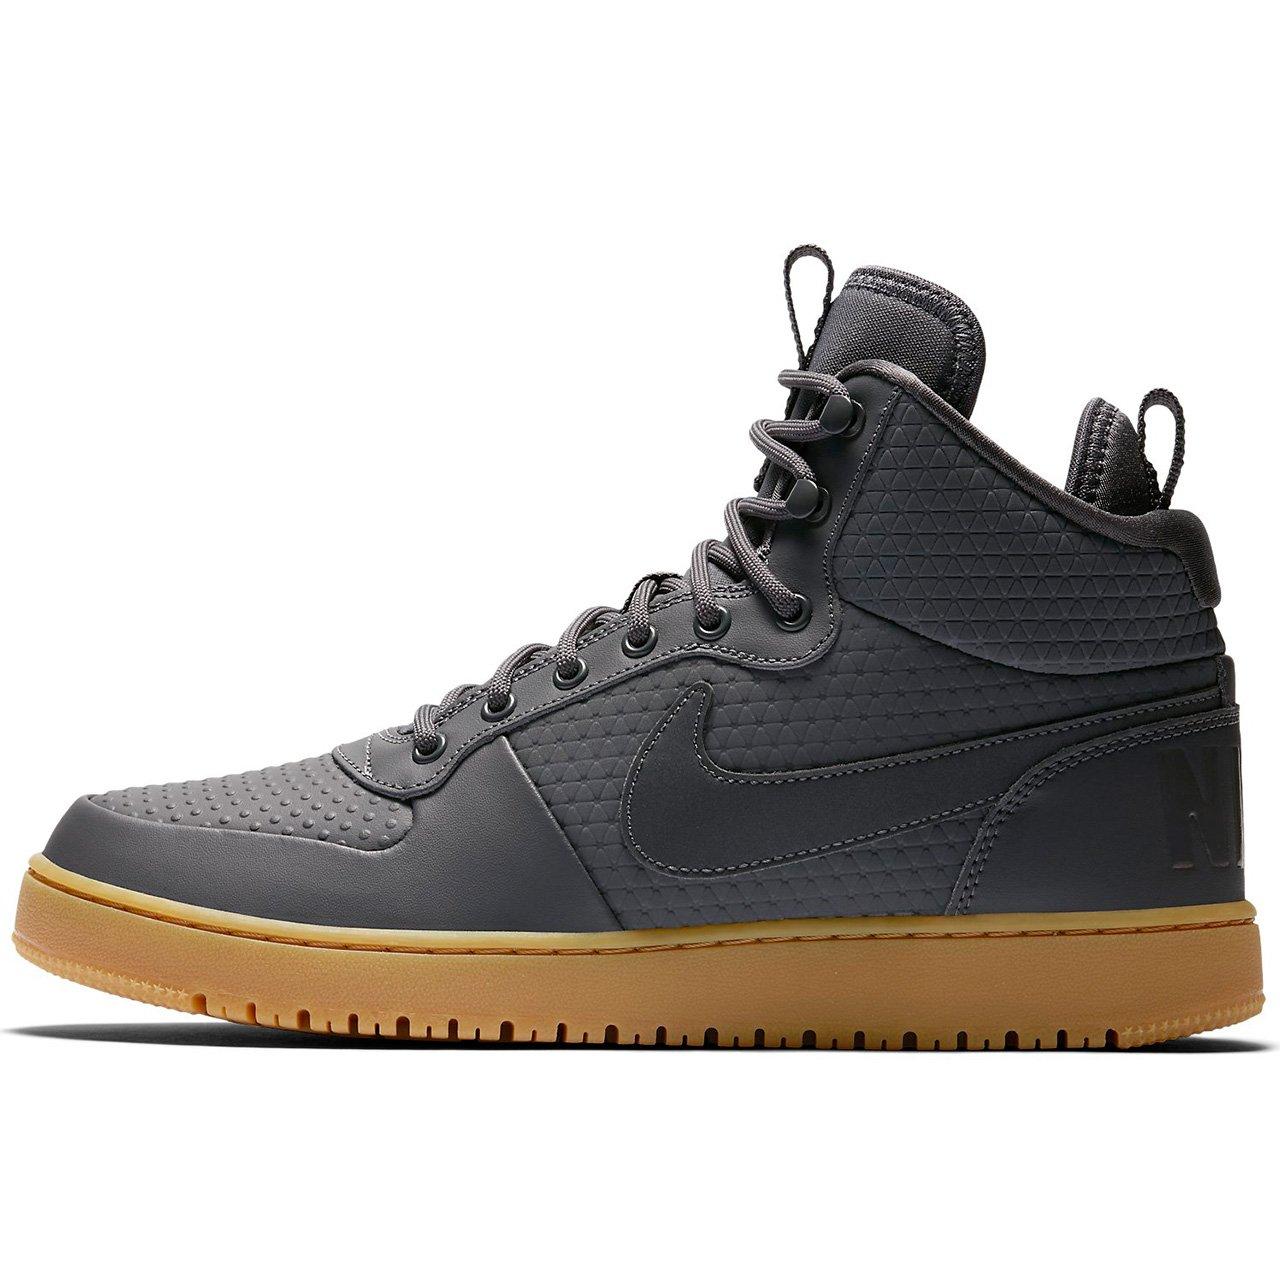 Nike Herren Court Borough Mid Winter Schuhe Schuhe Schuhe 40 EU|Grau associate 3f73c1